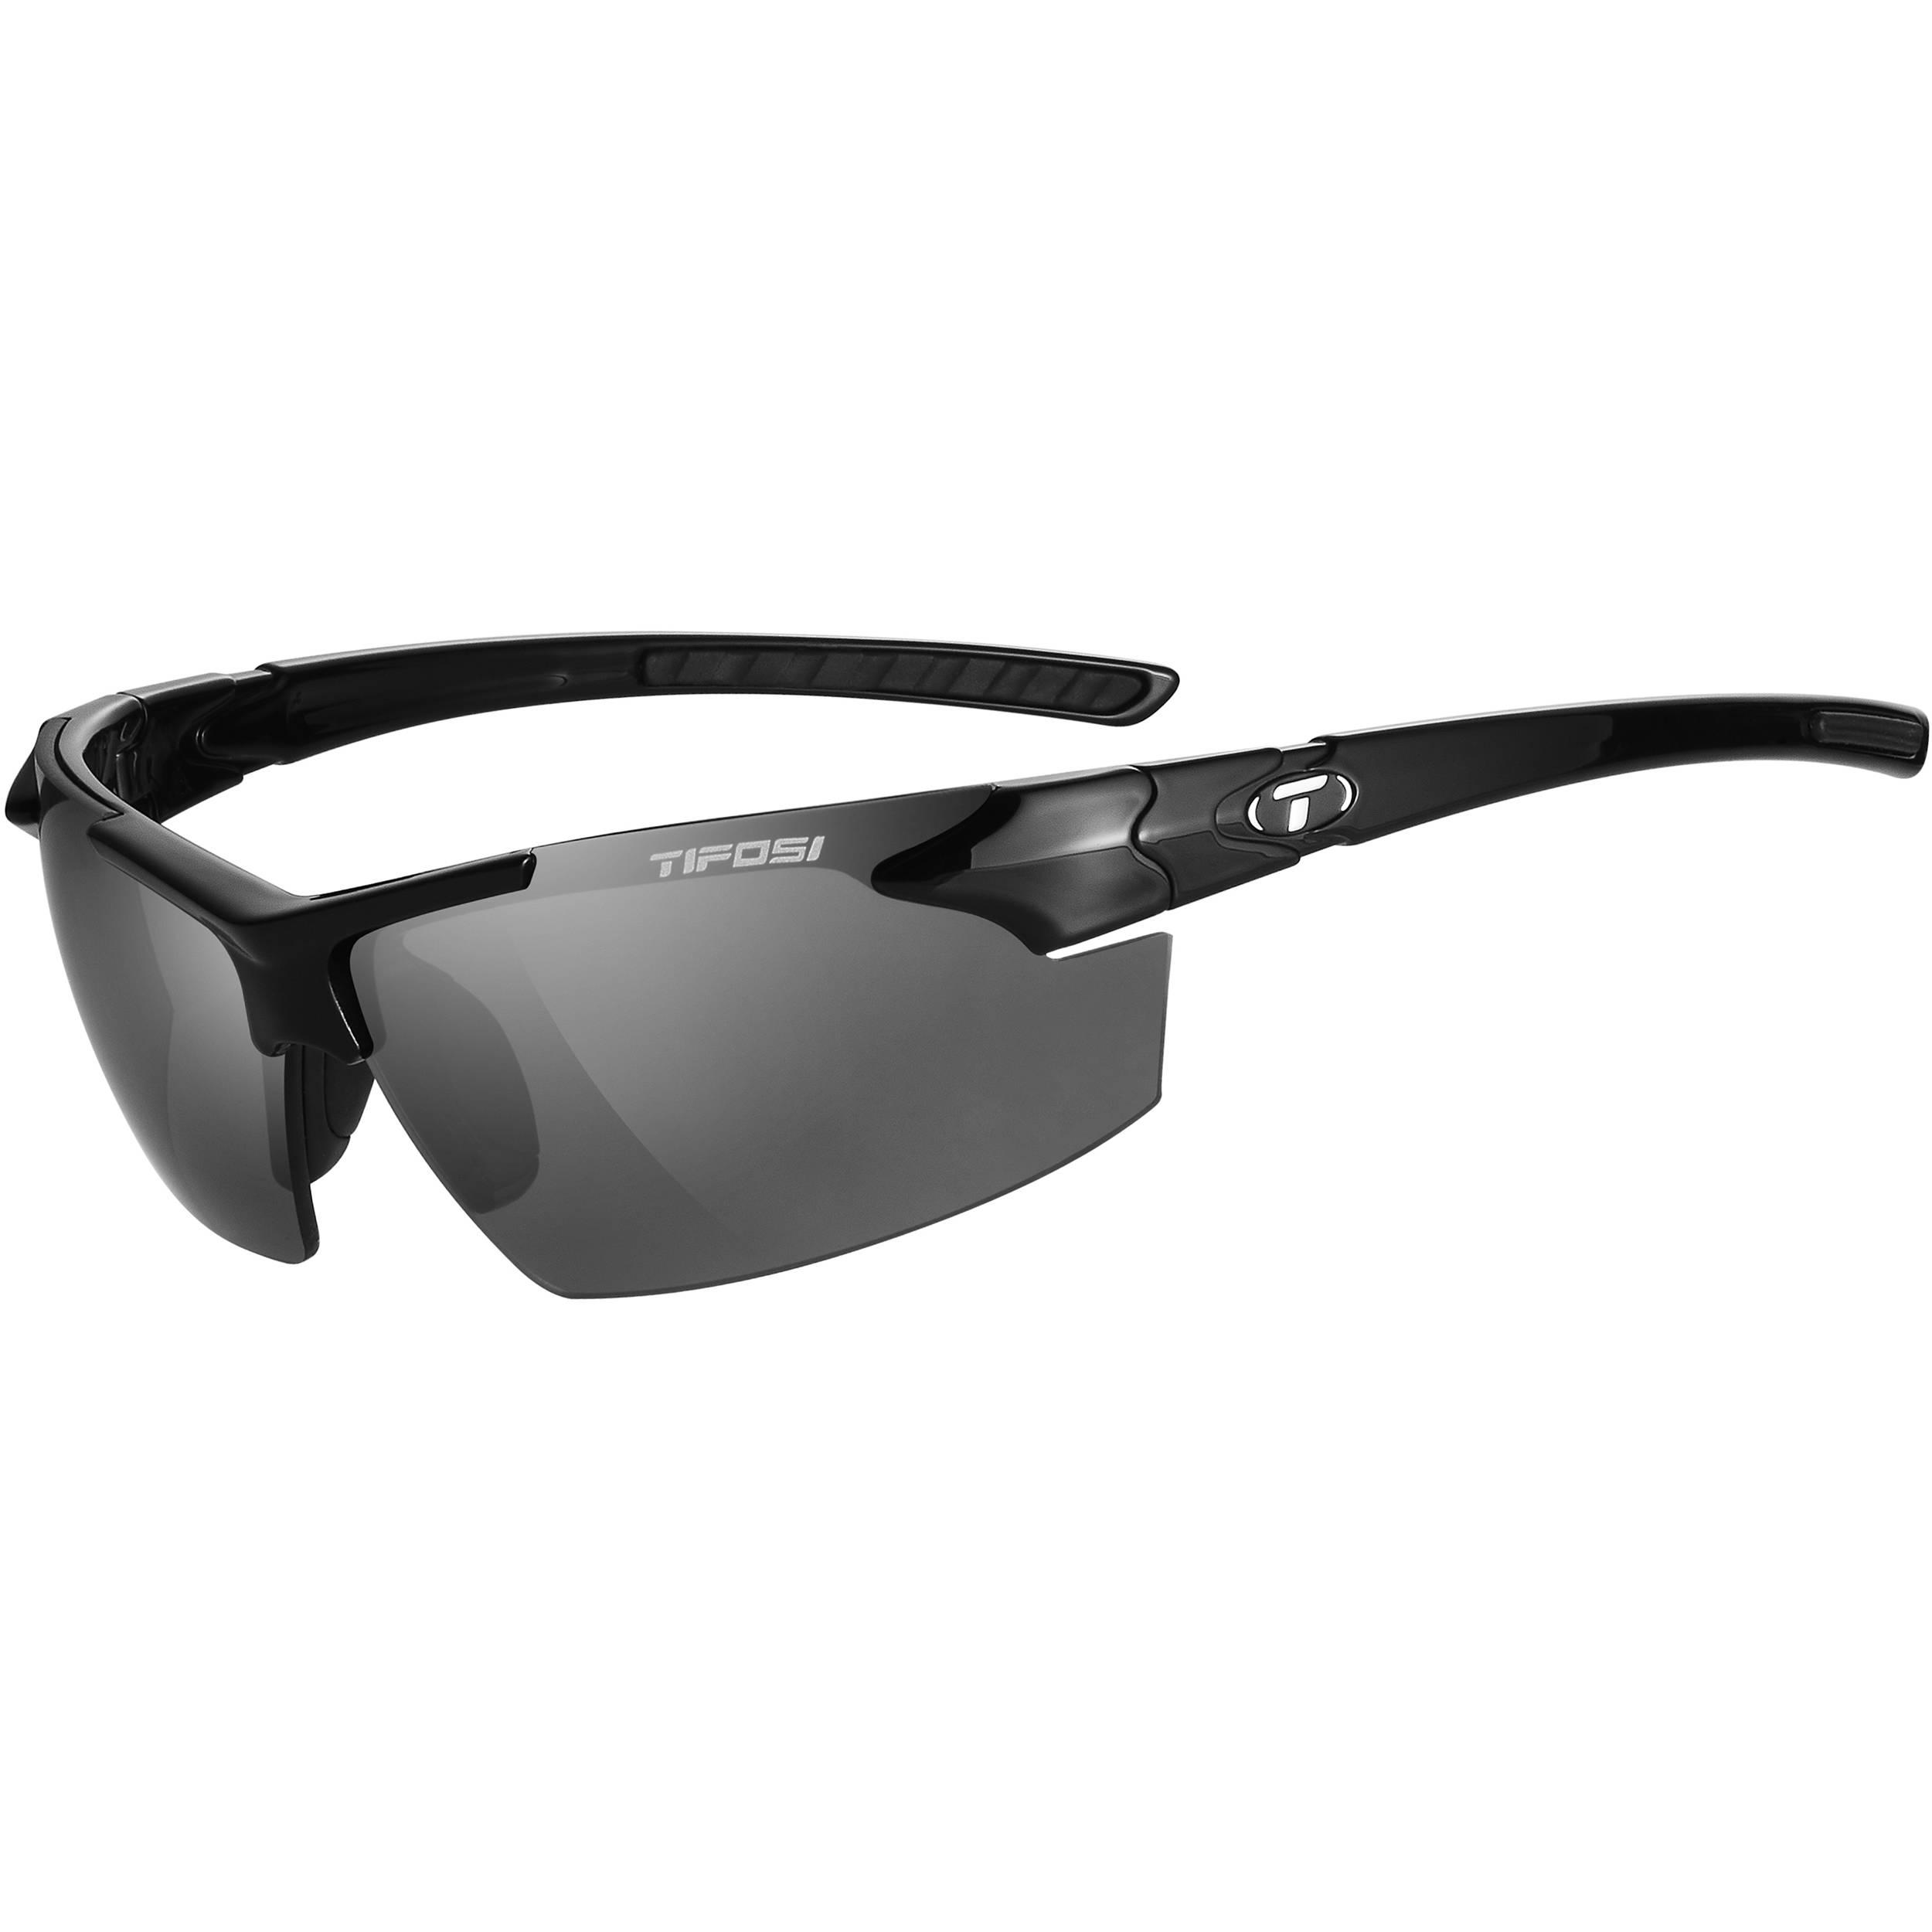 f5f1f4c3eb Tifosi Jet FC Sunglasses (Gloss Black Frames - Smoke Lenses)